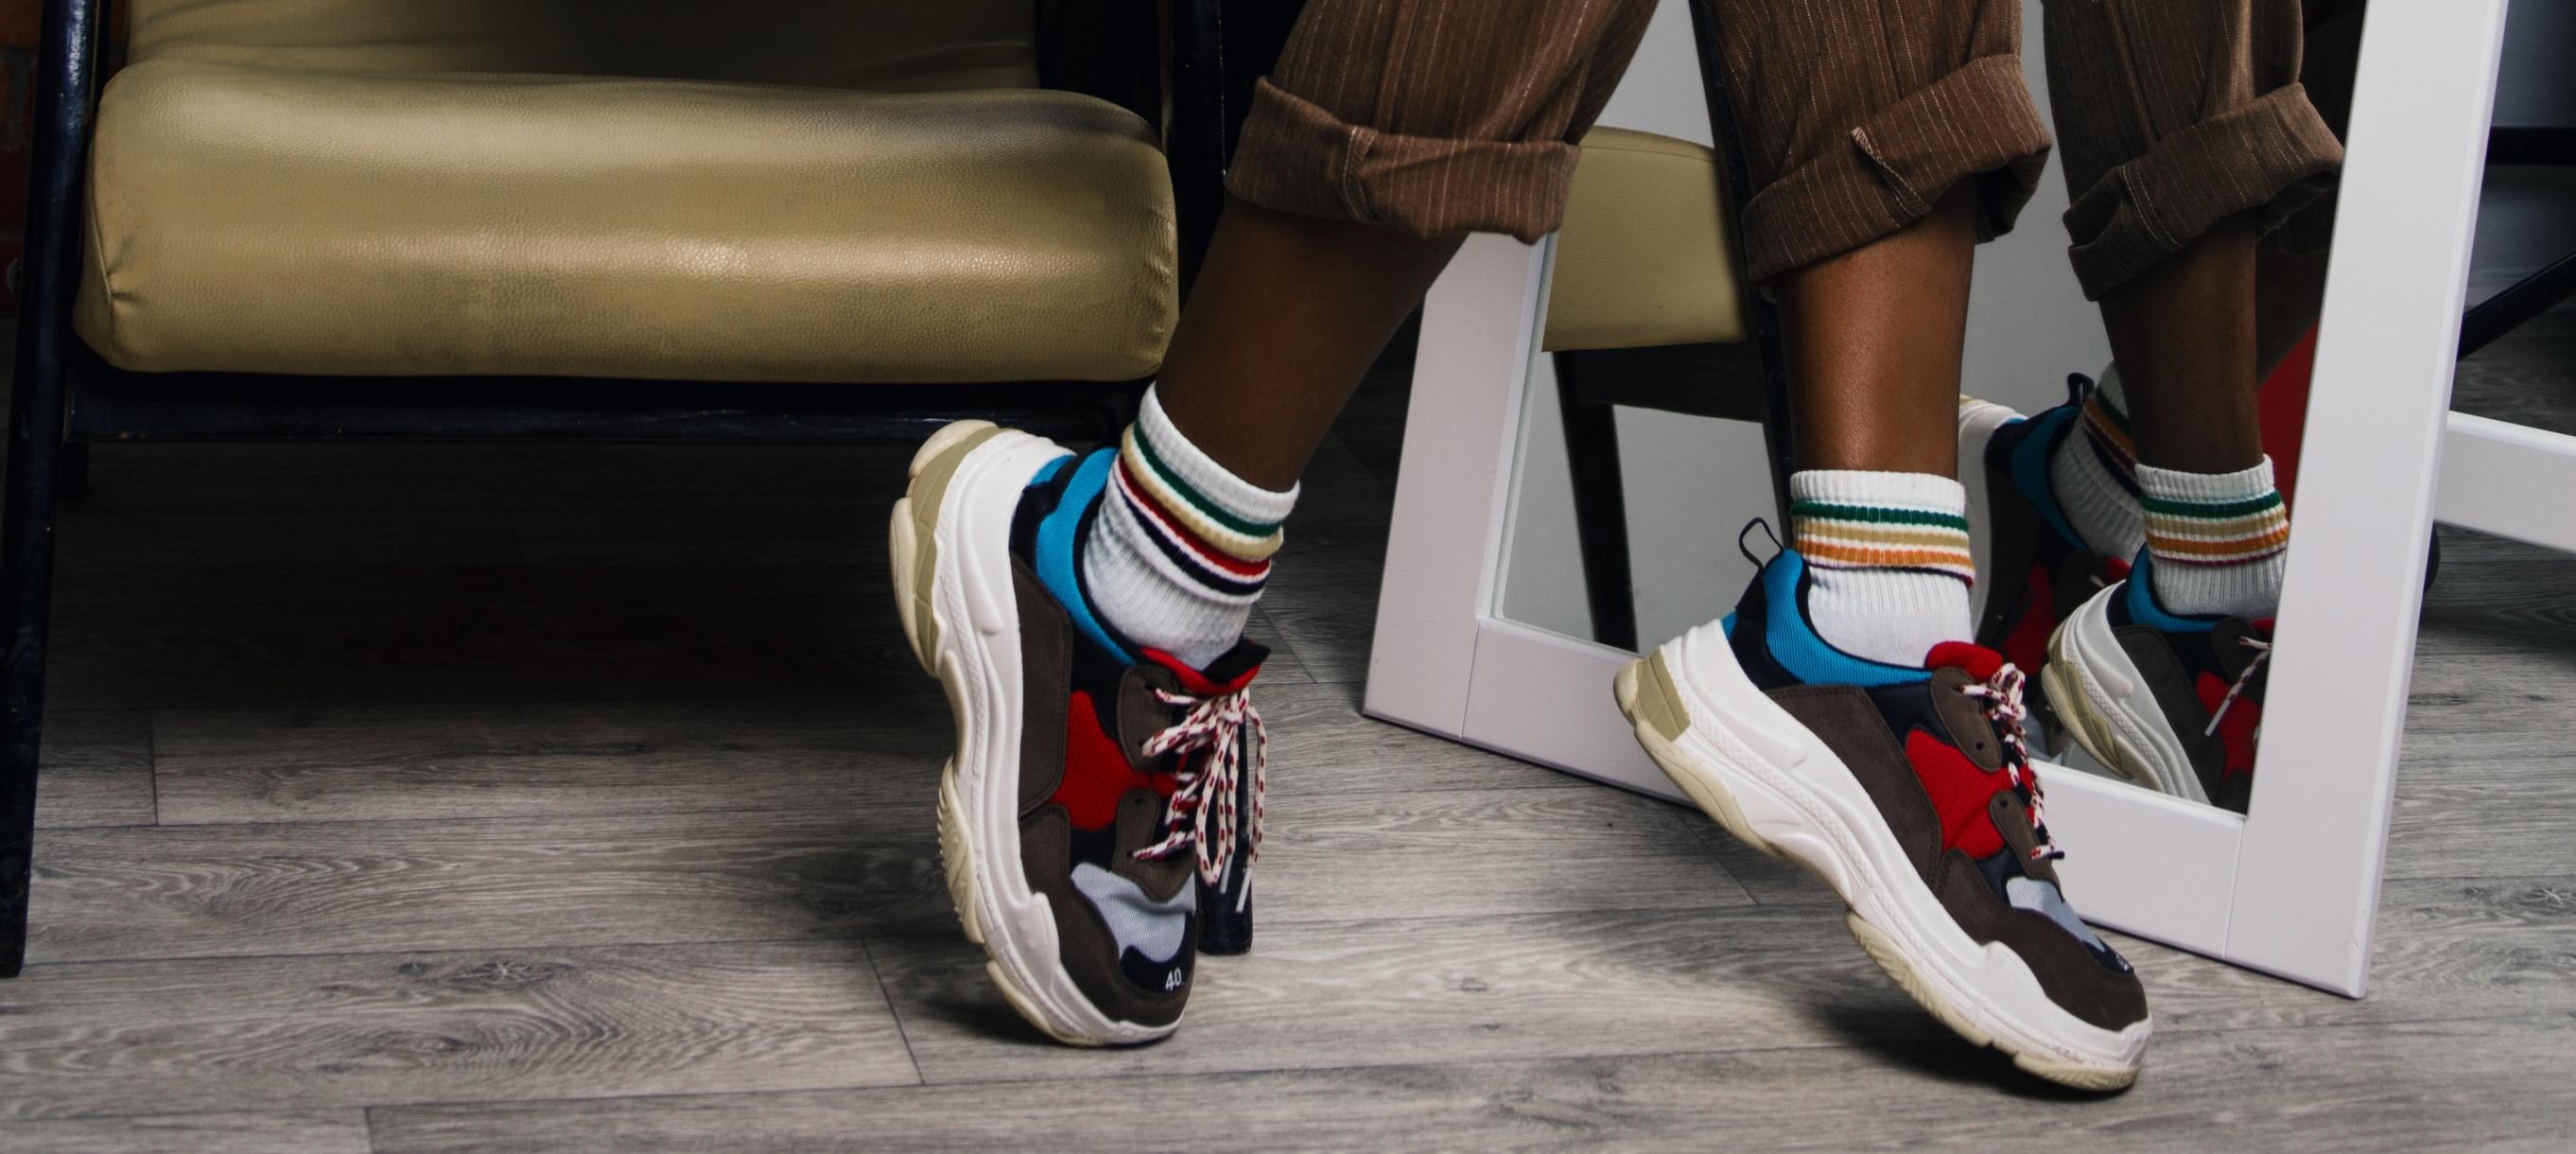 sneaker trends 2019 damen fashion up your life fashion. Black Bedroom Furniture Sets. Home Design Ideas